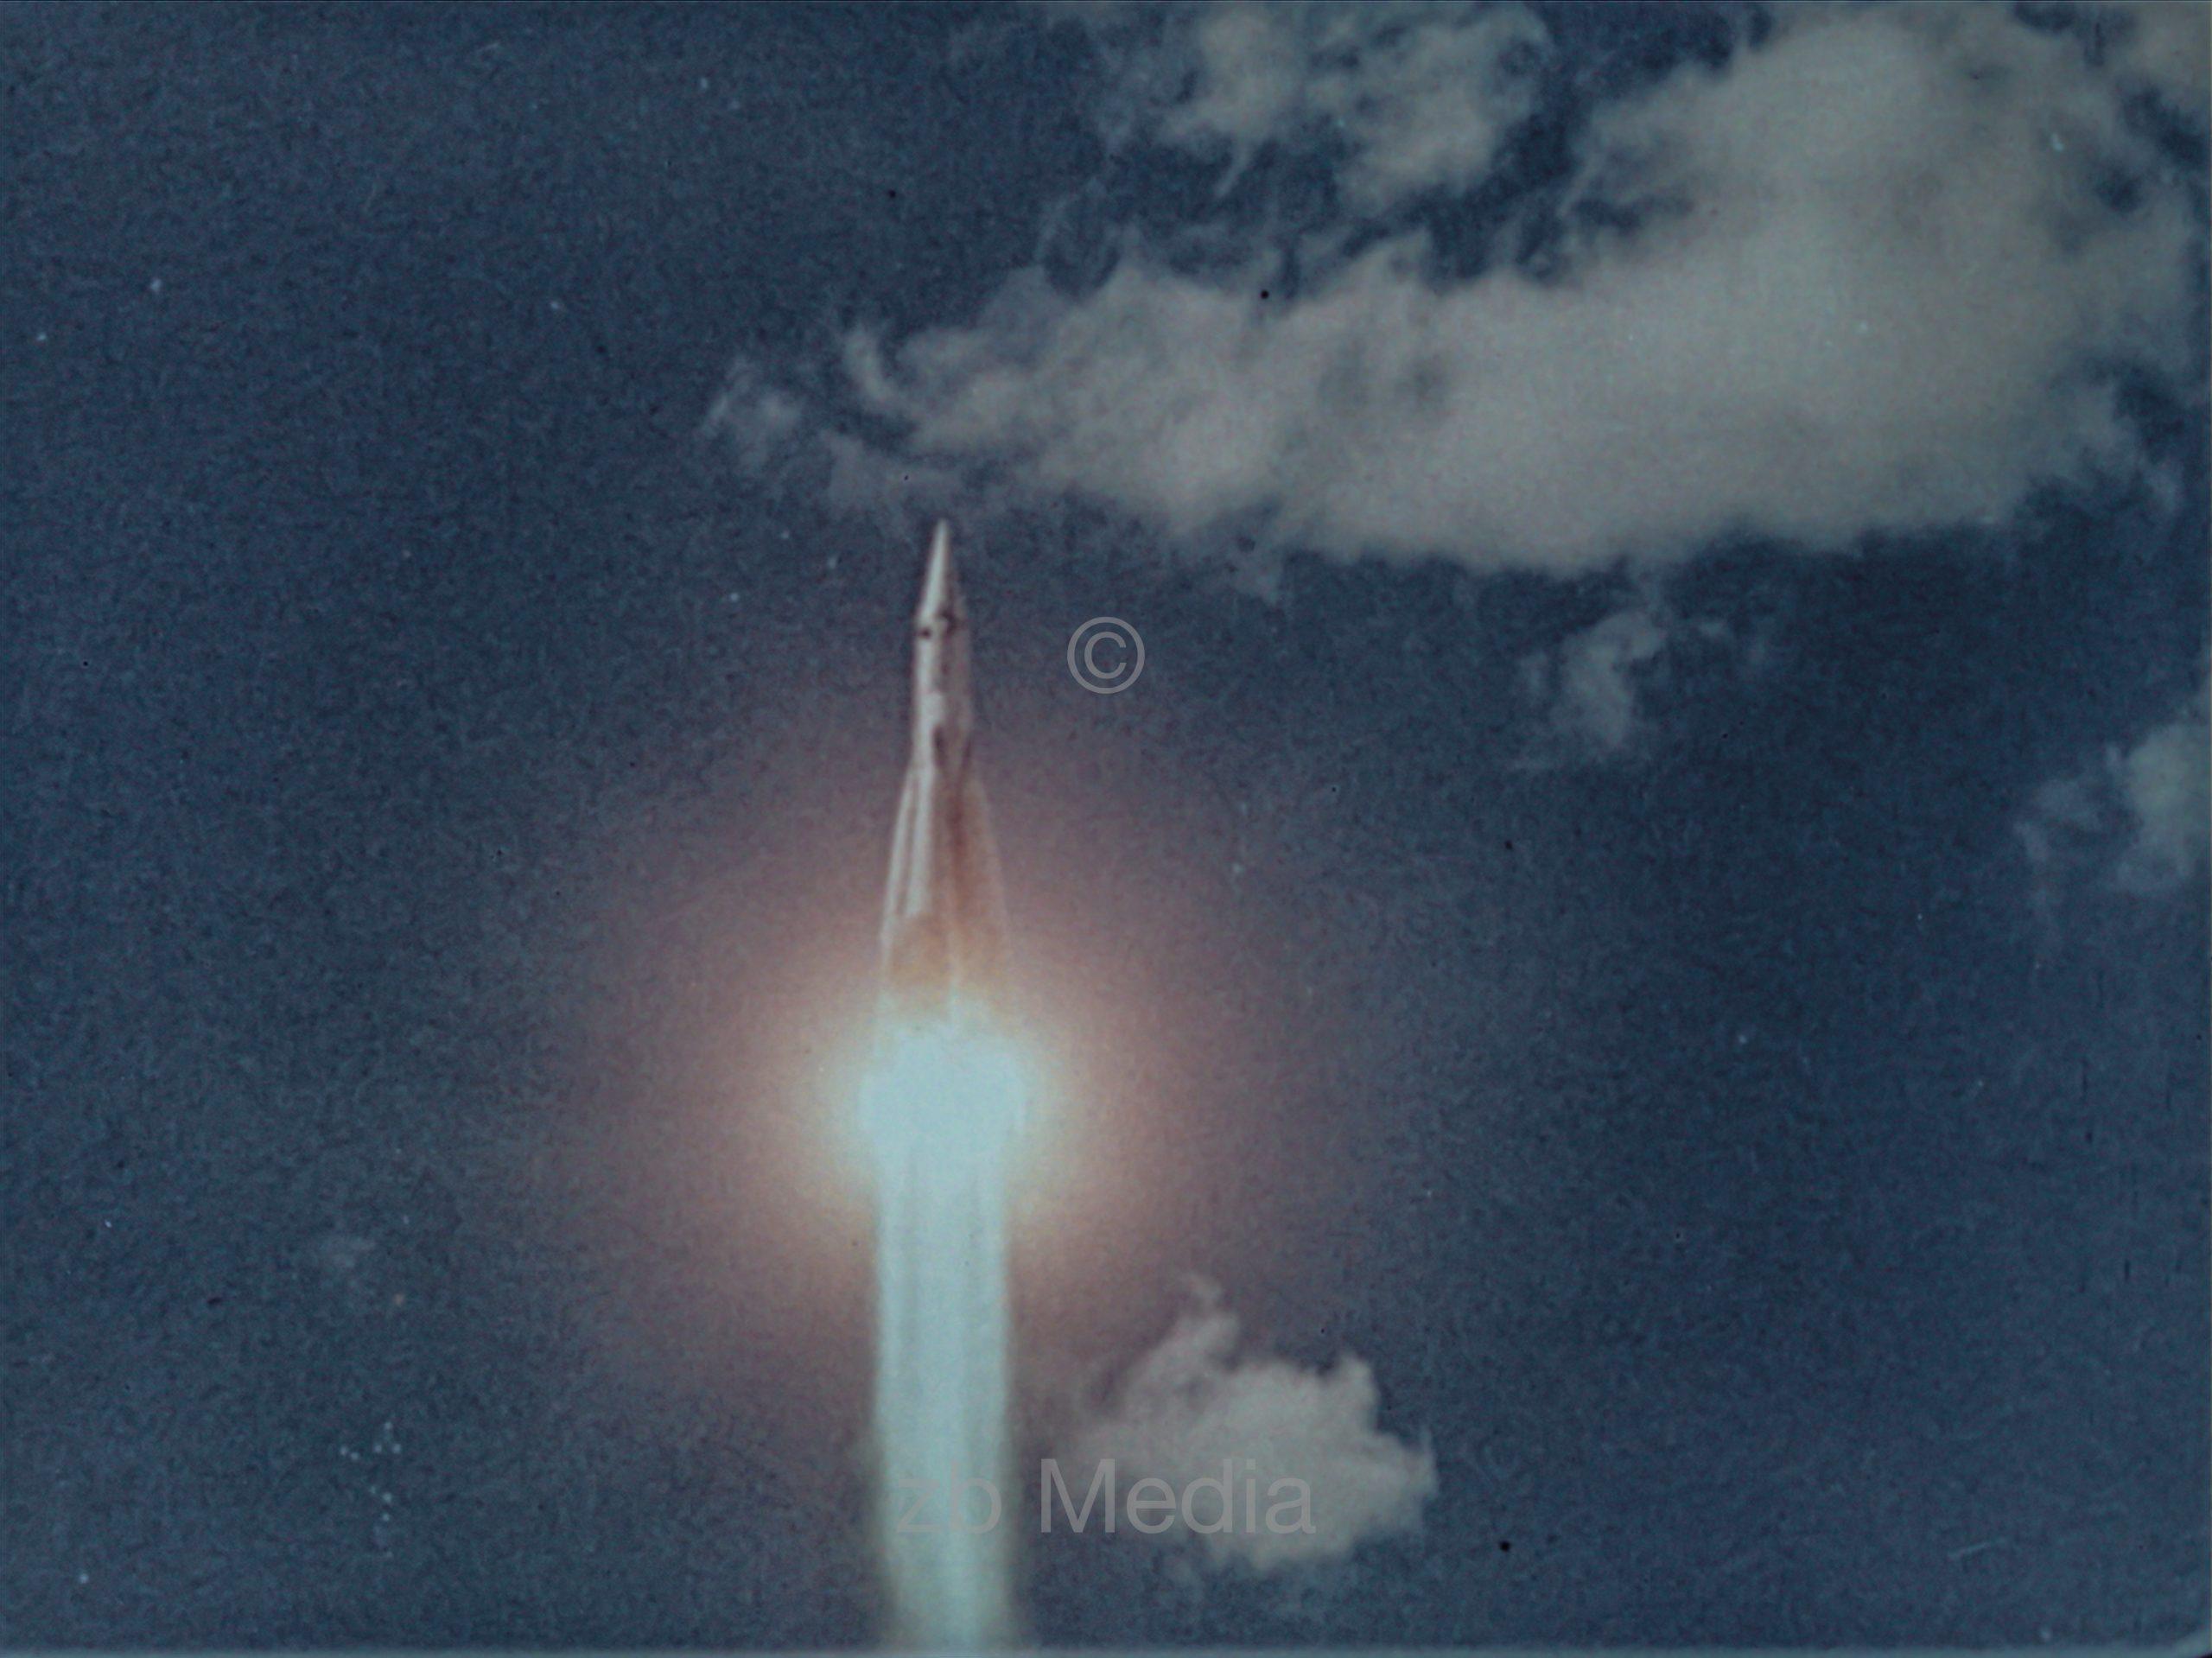 Vostok Rakete startet